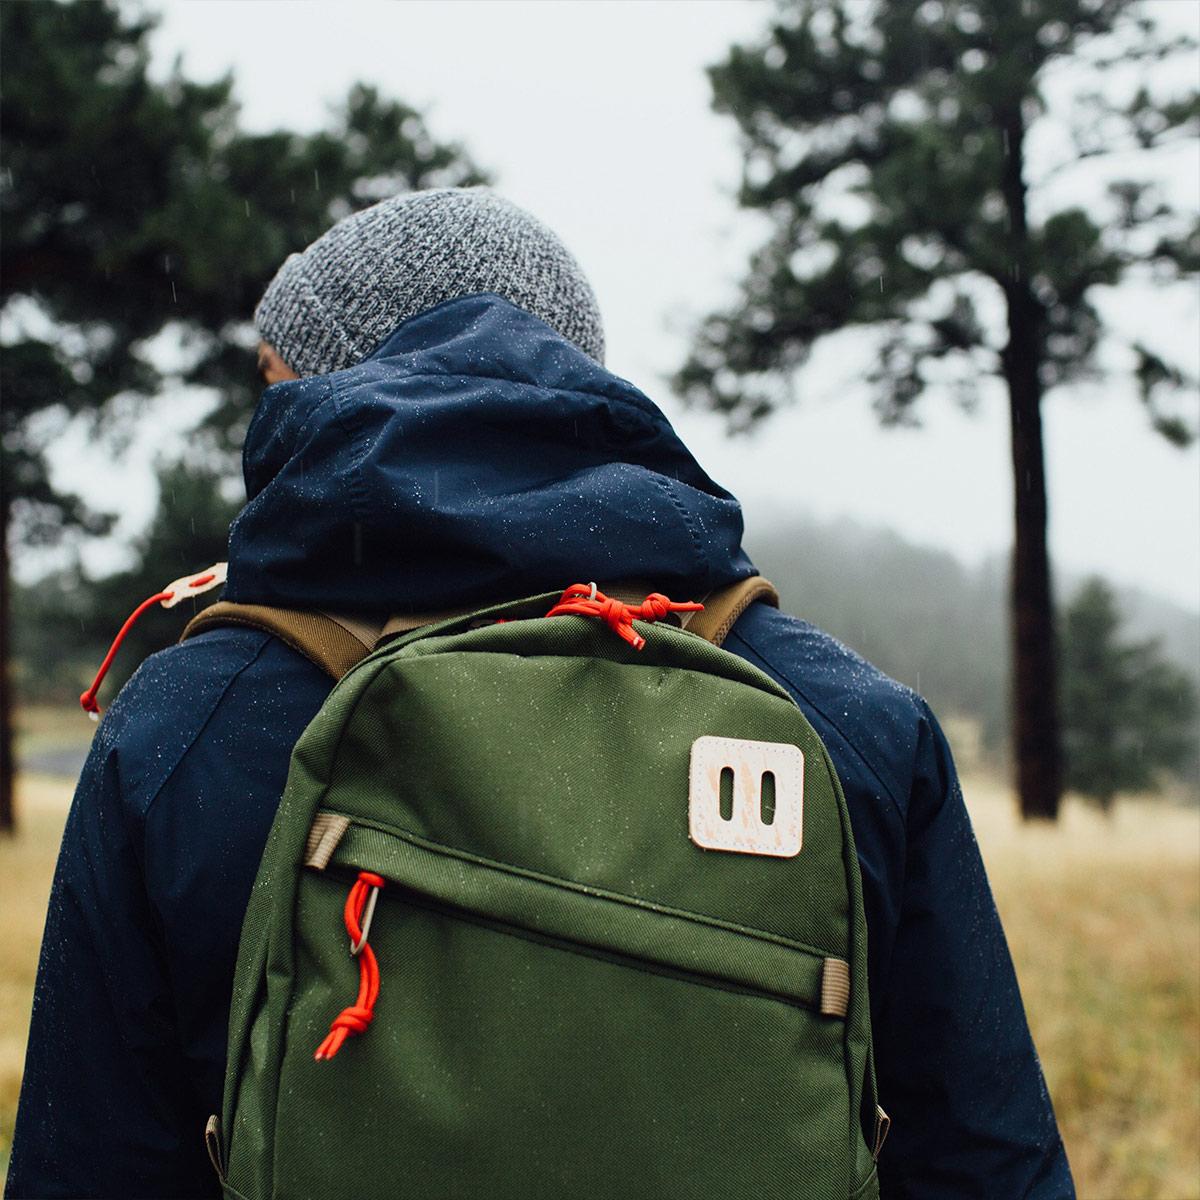 Topo Designs Daypack backpack Olive, starker Rucksack in 1000D Cordura mit 15 Zoll Laptopfach